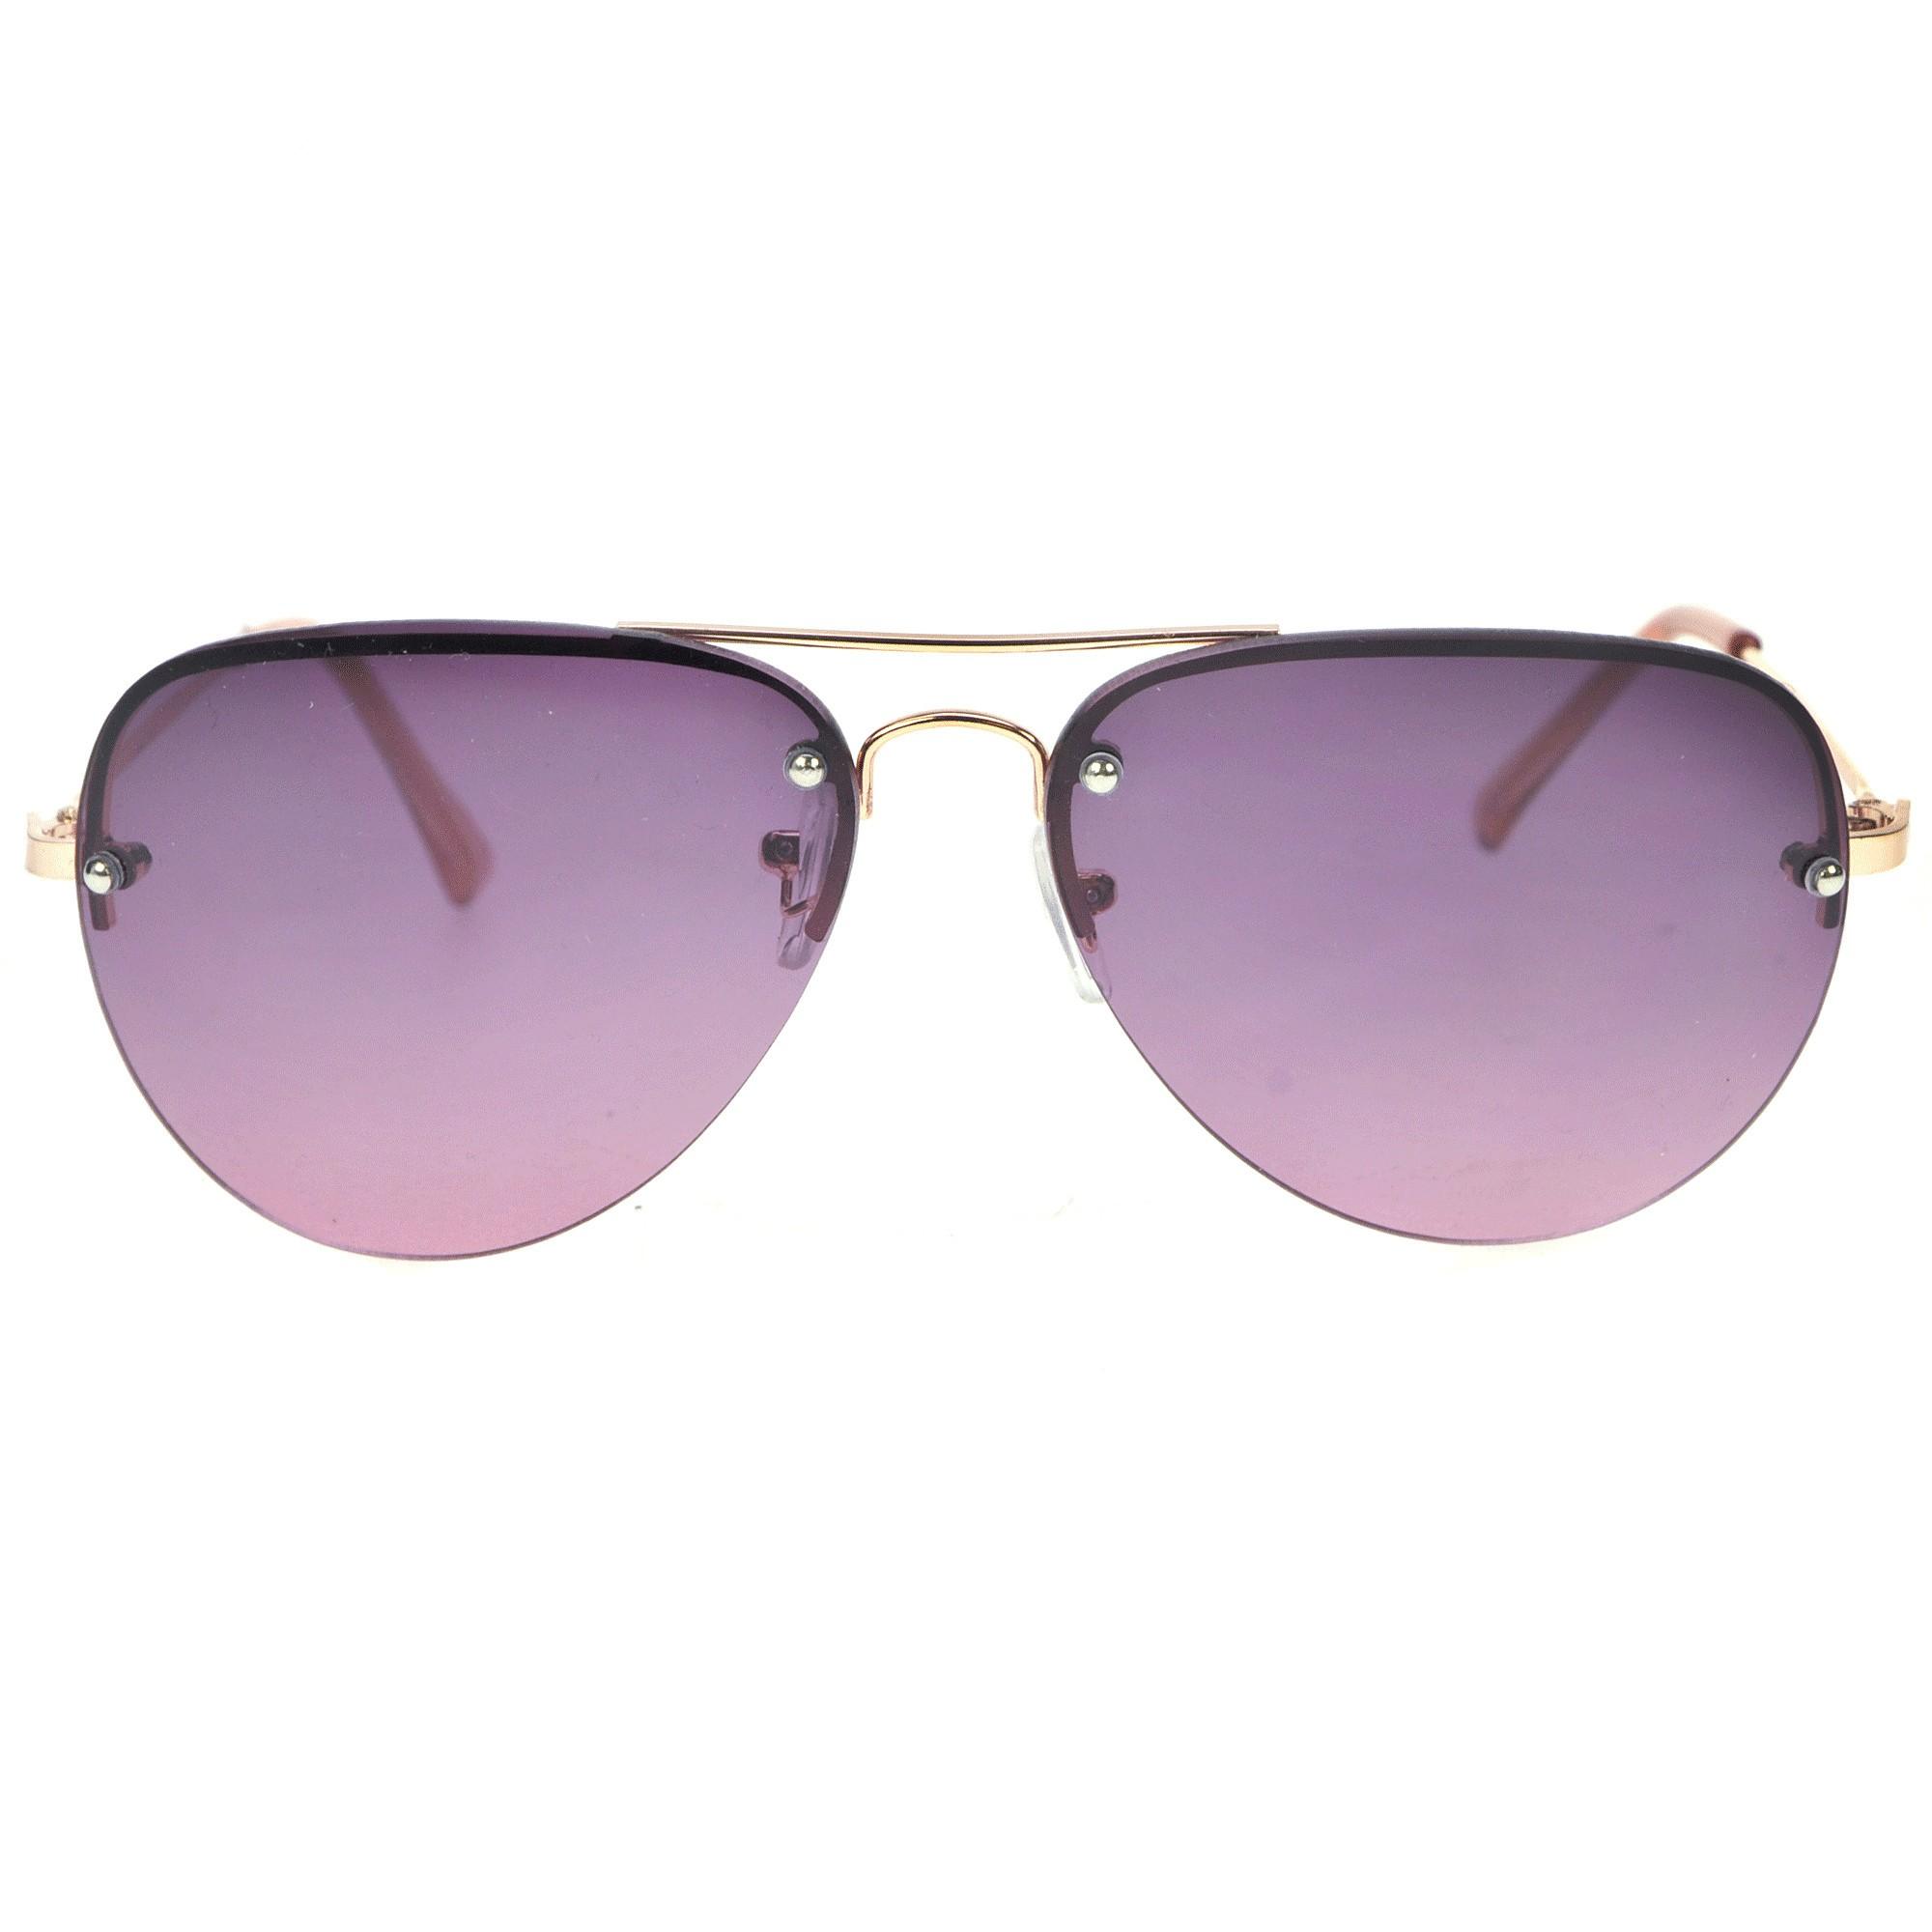 McKenzie Lesley Sunglasses